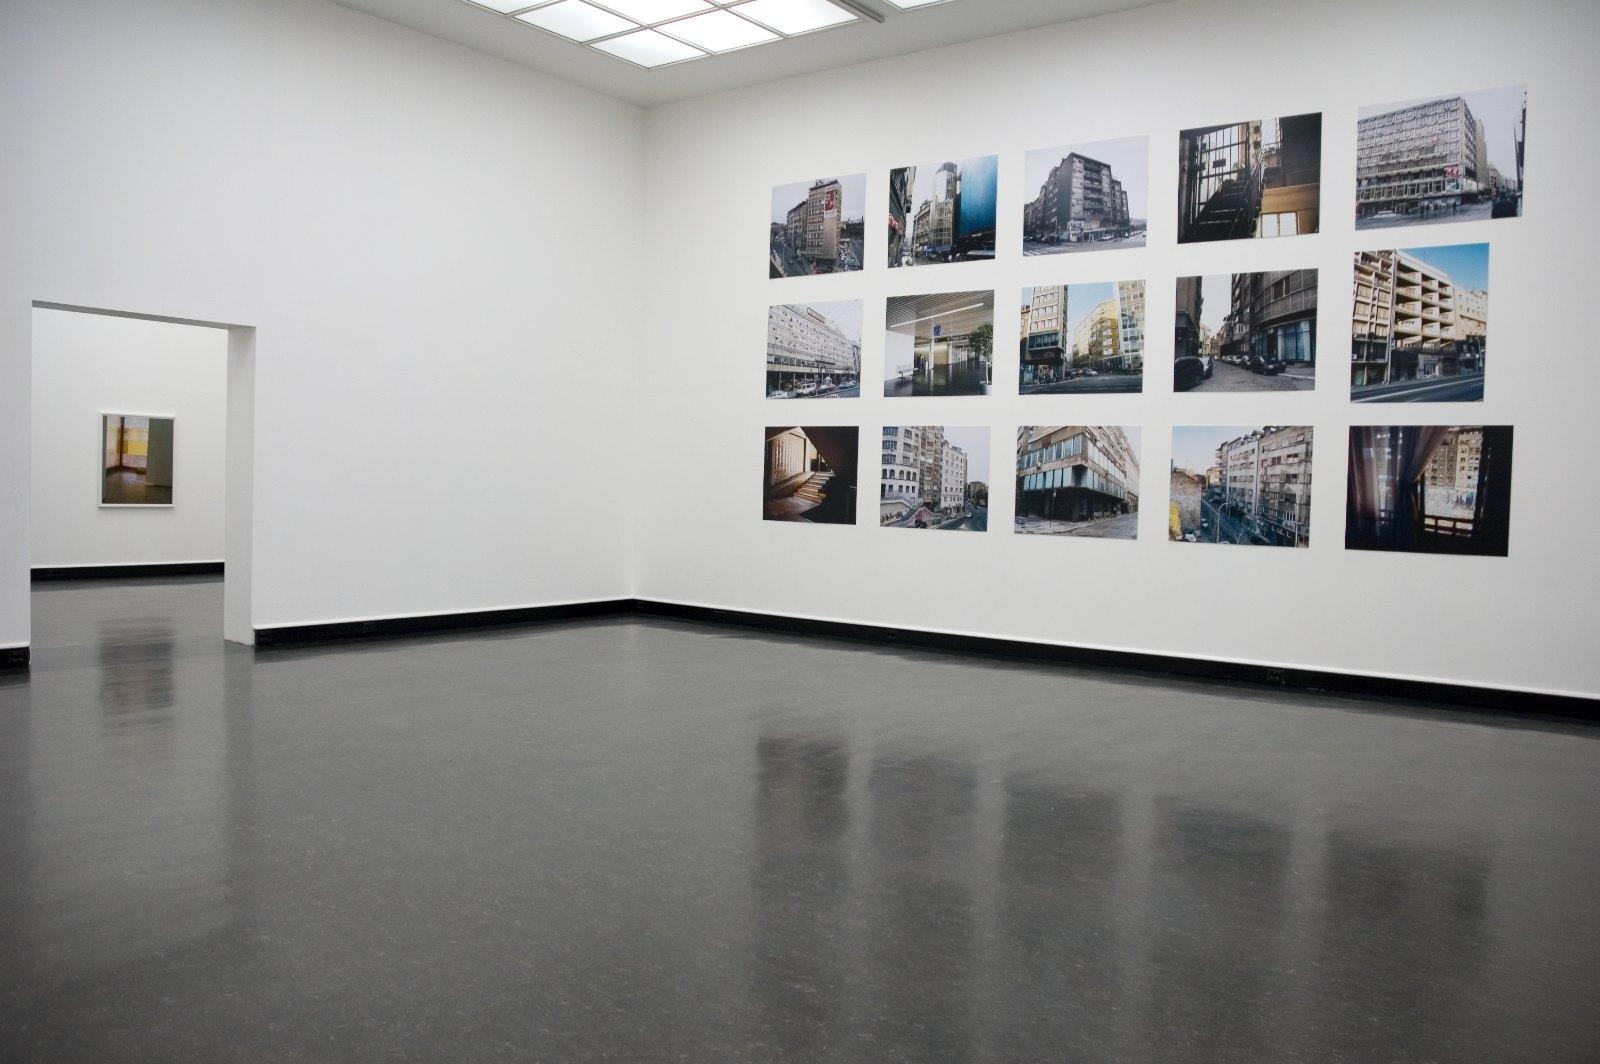 Installation view Eline Mugaas, Some Cities, Bergen Kunsthall, Bergen, Norway, 2007